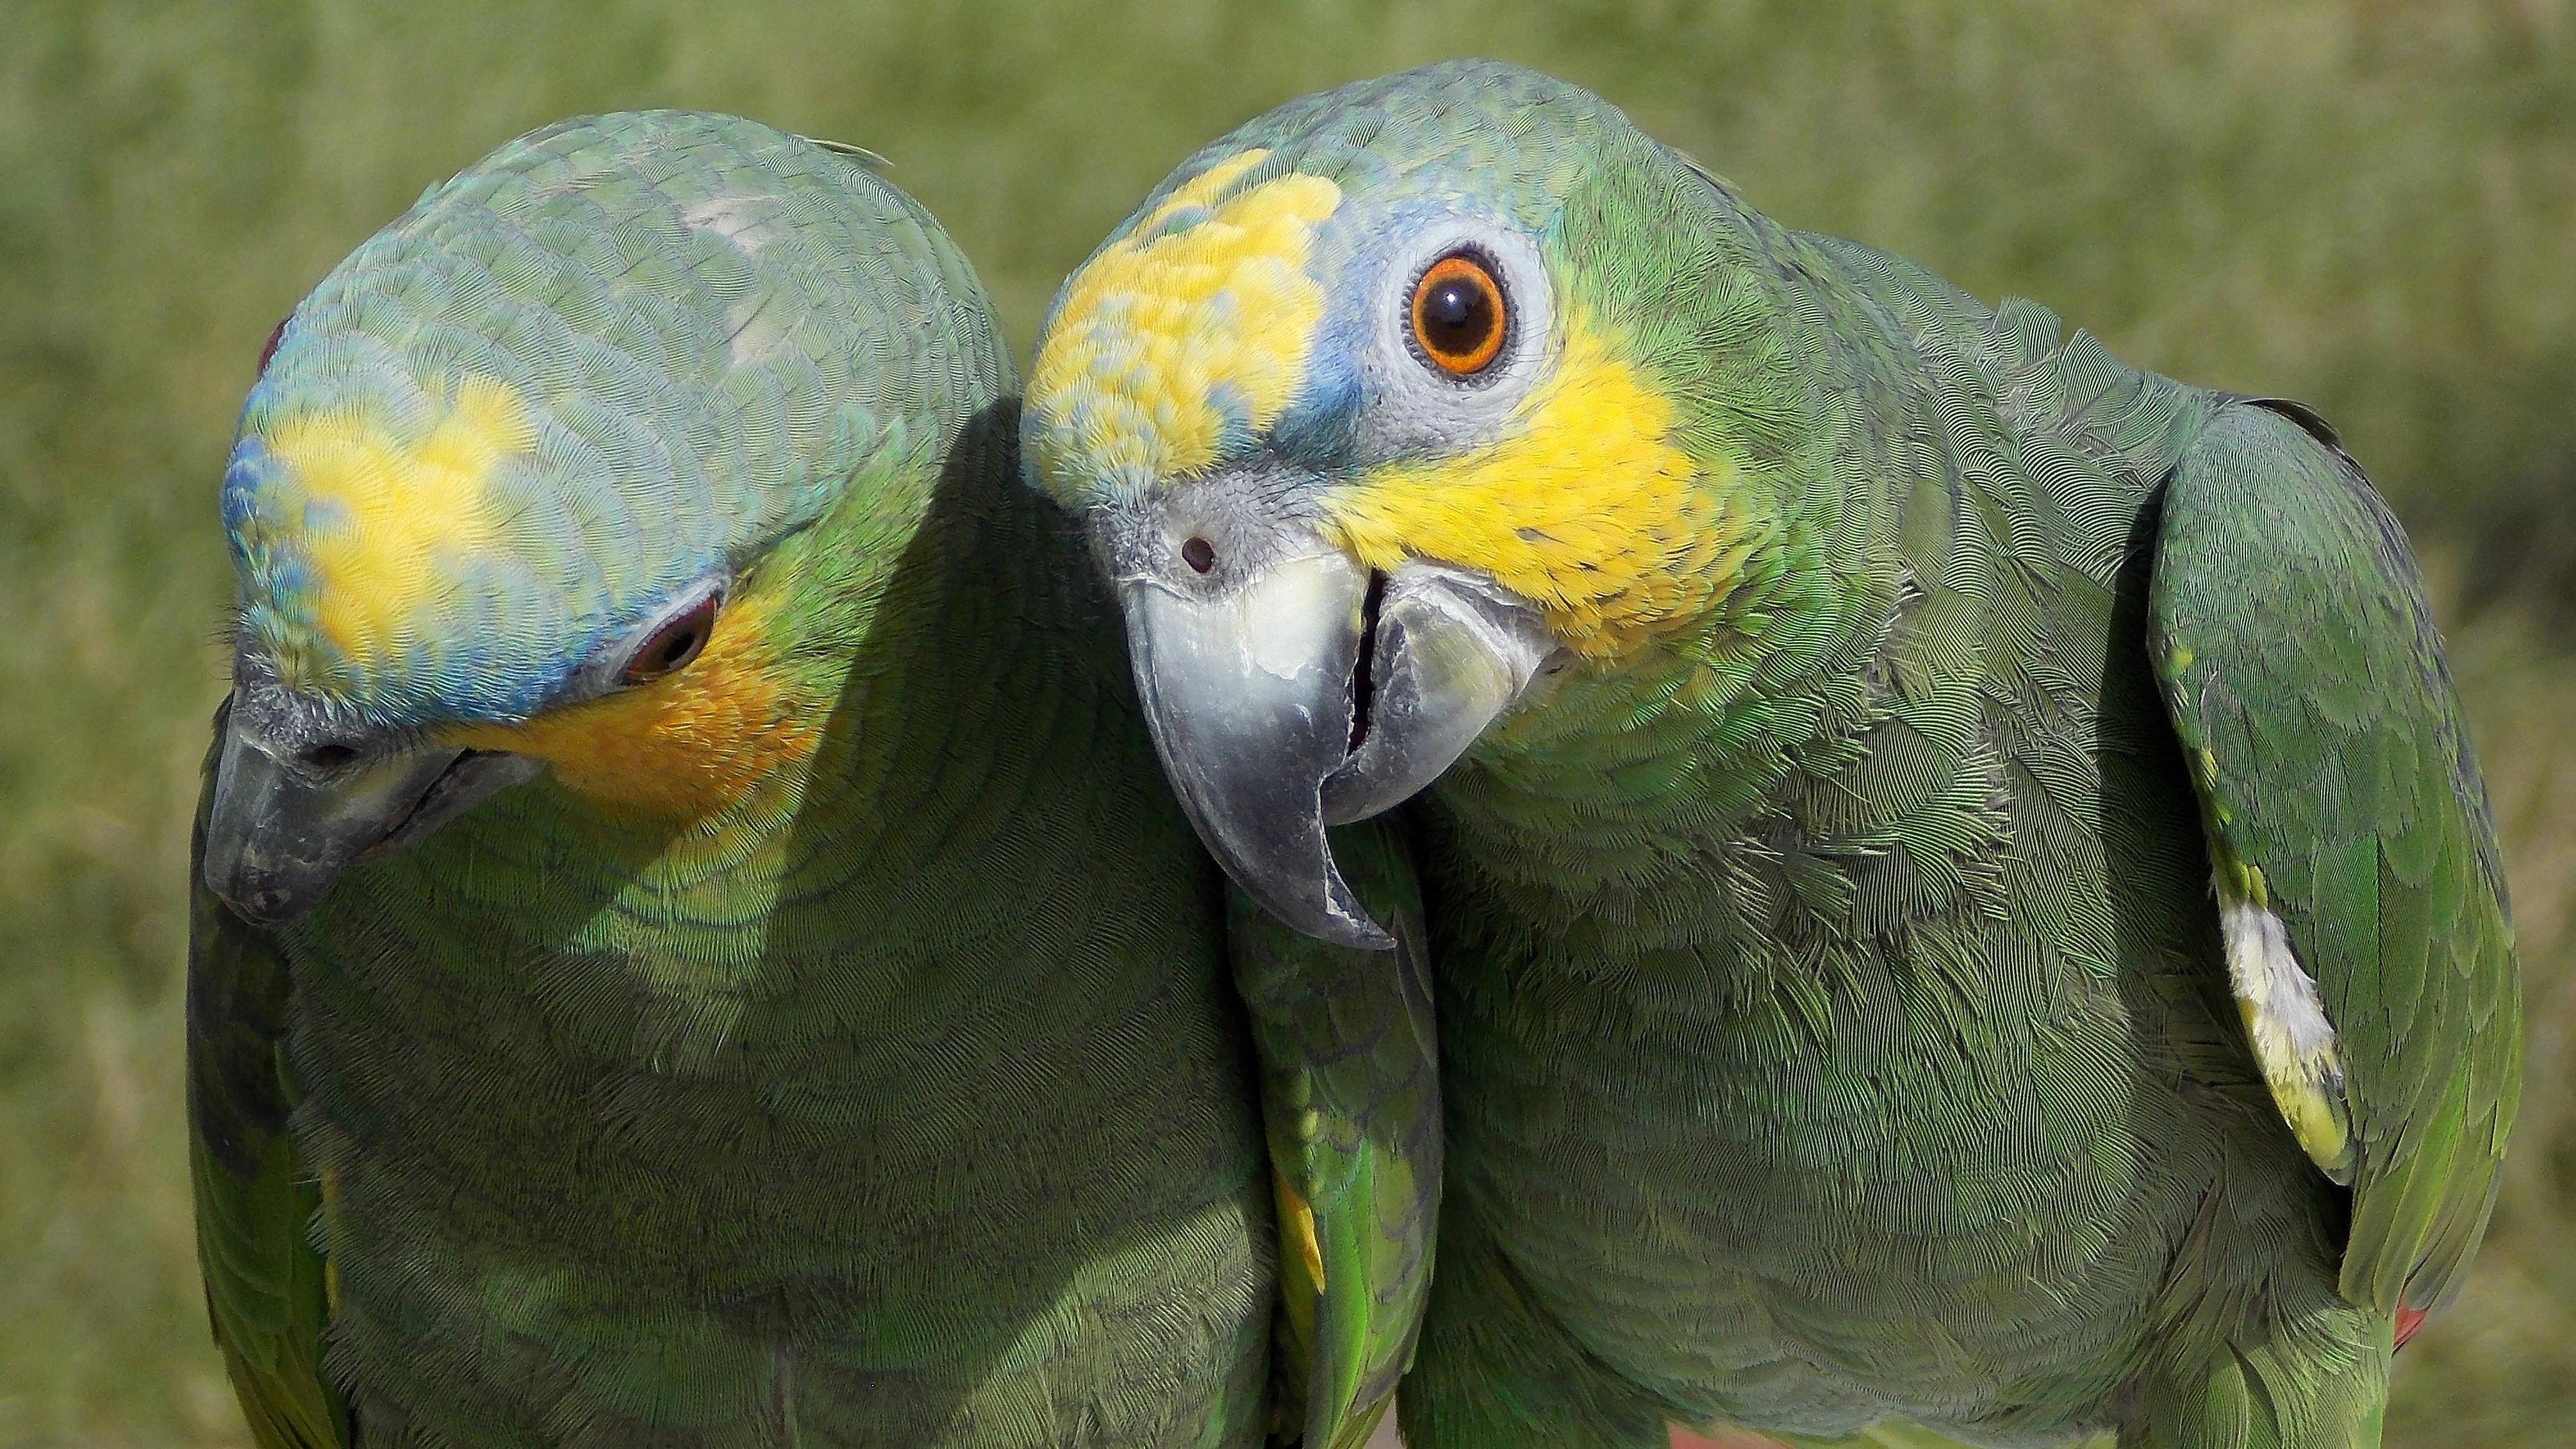 fond d 39 cran les yeux la nature perroquet ailes plumes fermer vert jaune bleu orange. Black Bedroom Furniture Sets. Home Design Ideas